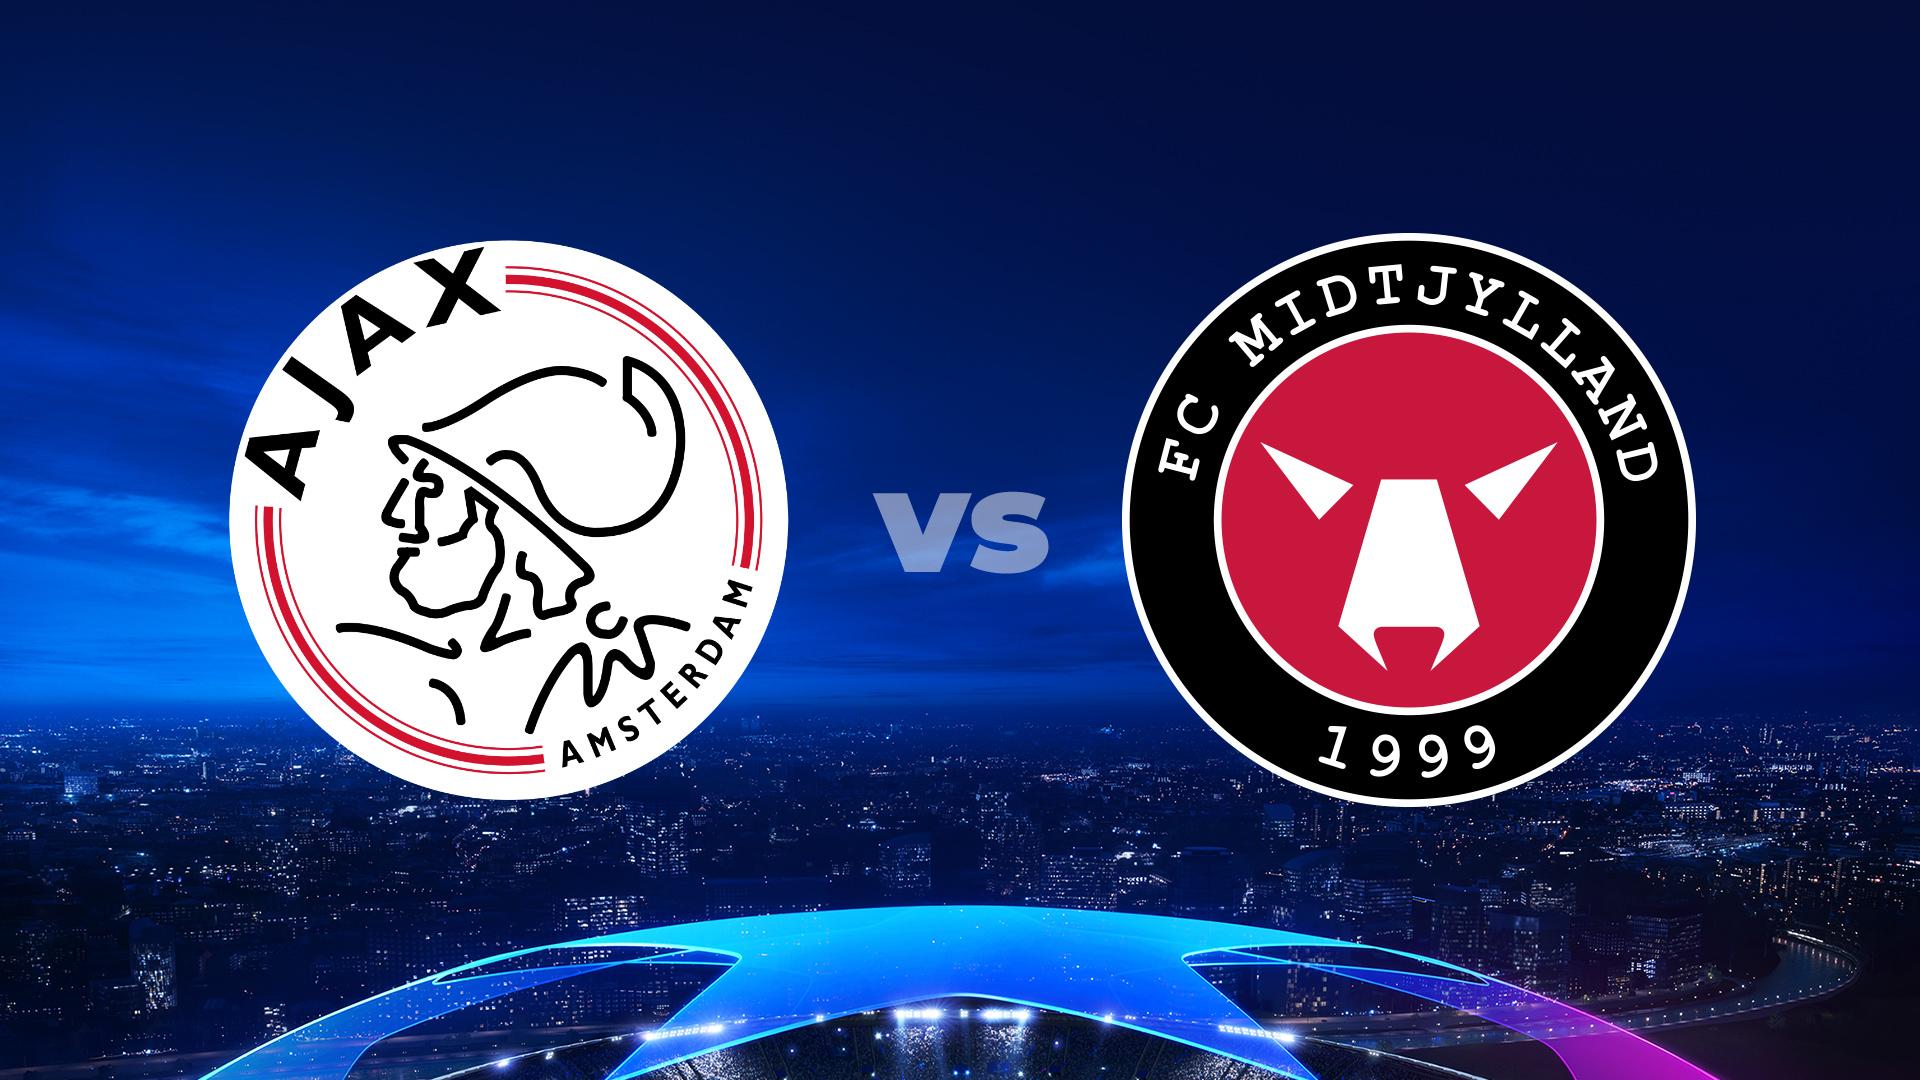 Ajax Amsterdam - FC Midtjylland